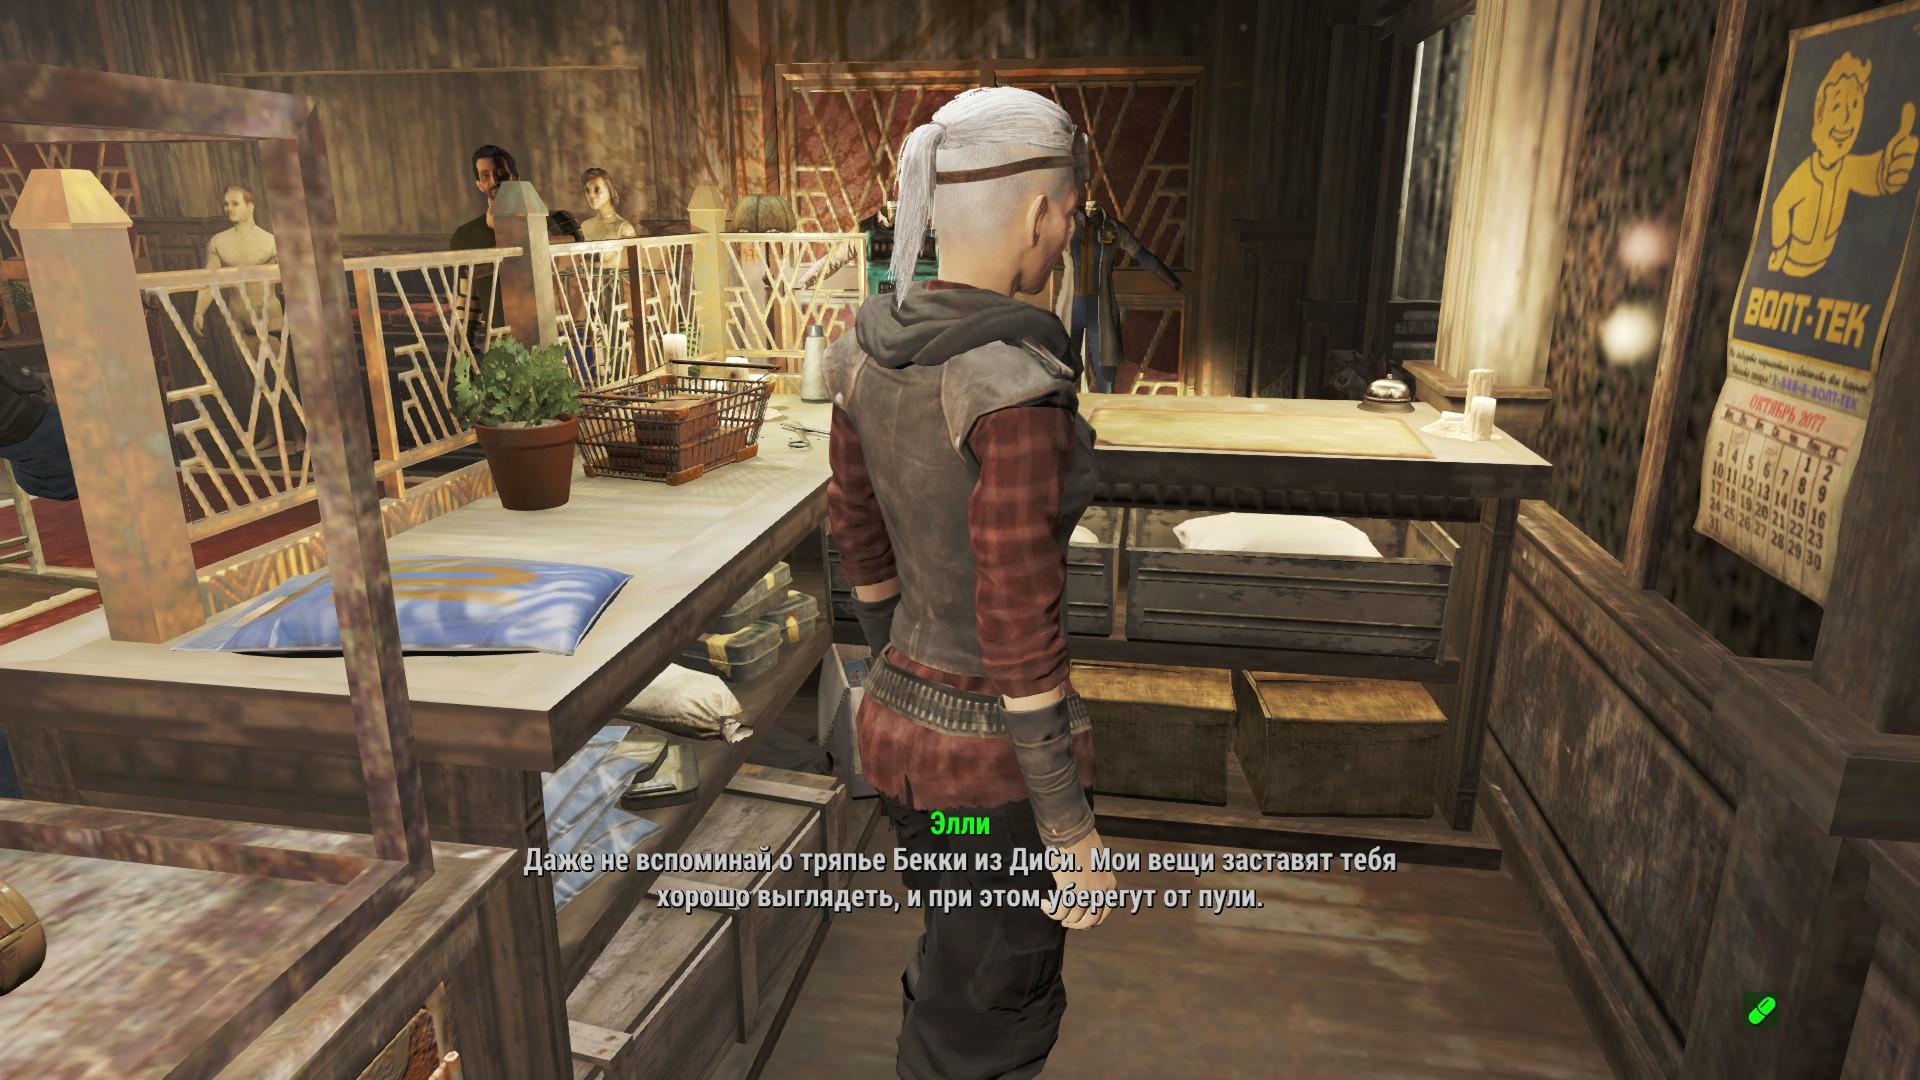 20170930115824_1.jpg - Fallout 4